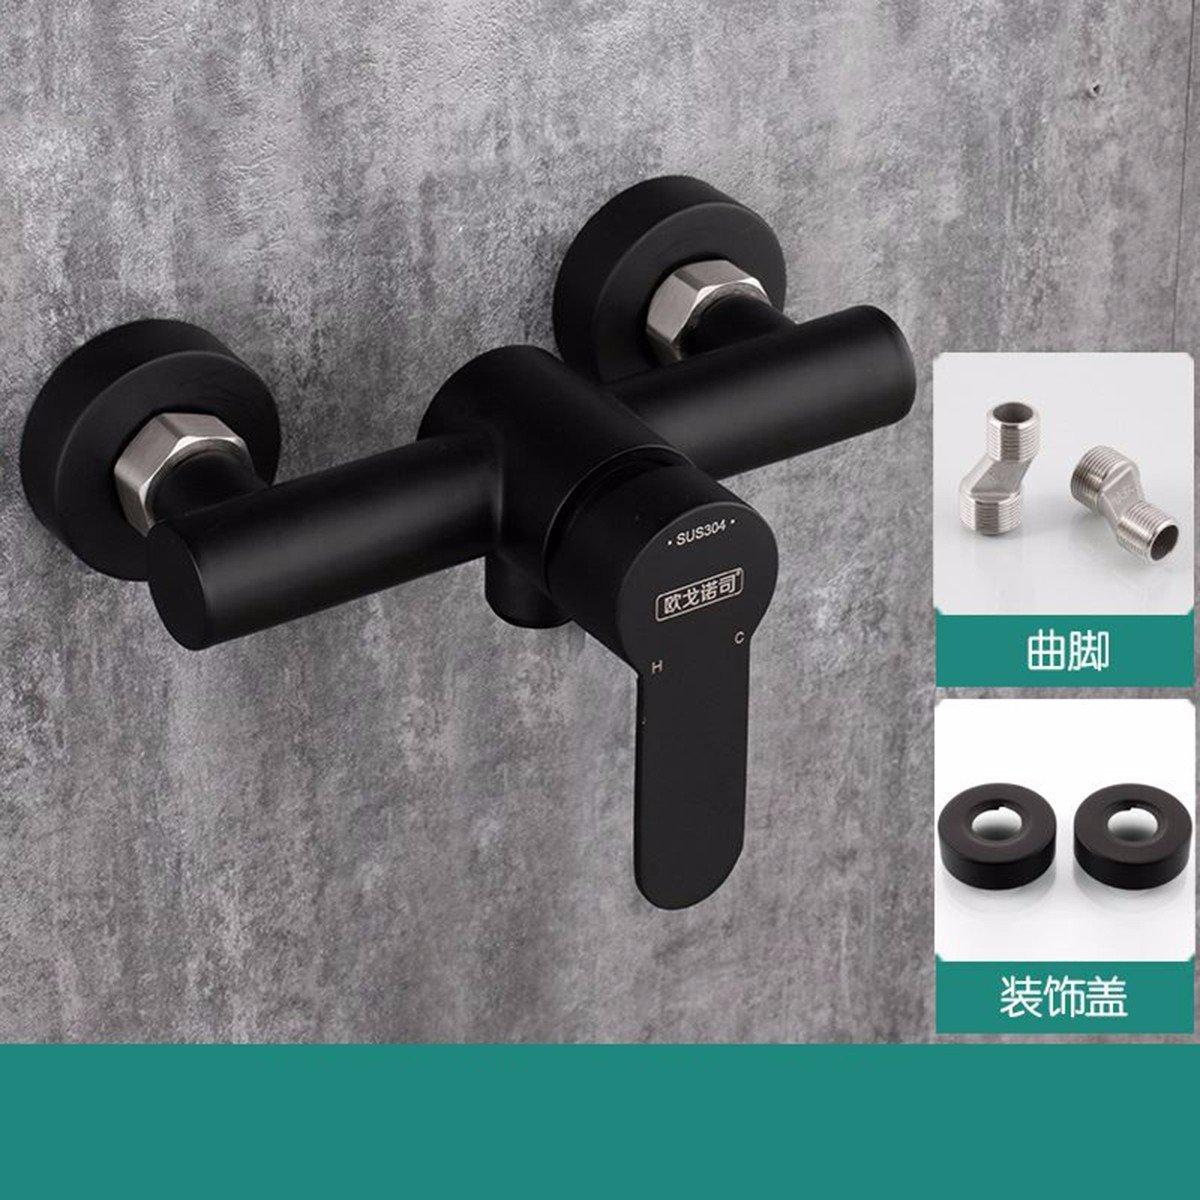 D Shower 304 Stainless Steel Shower Set Black Matte Matte European Hot And Cold Bath Water Mixing Valve,B